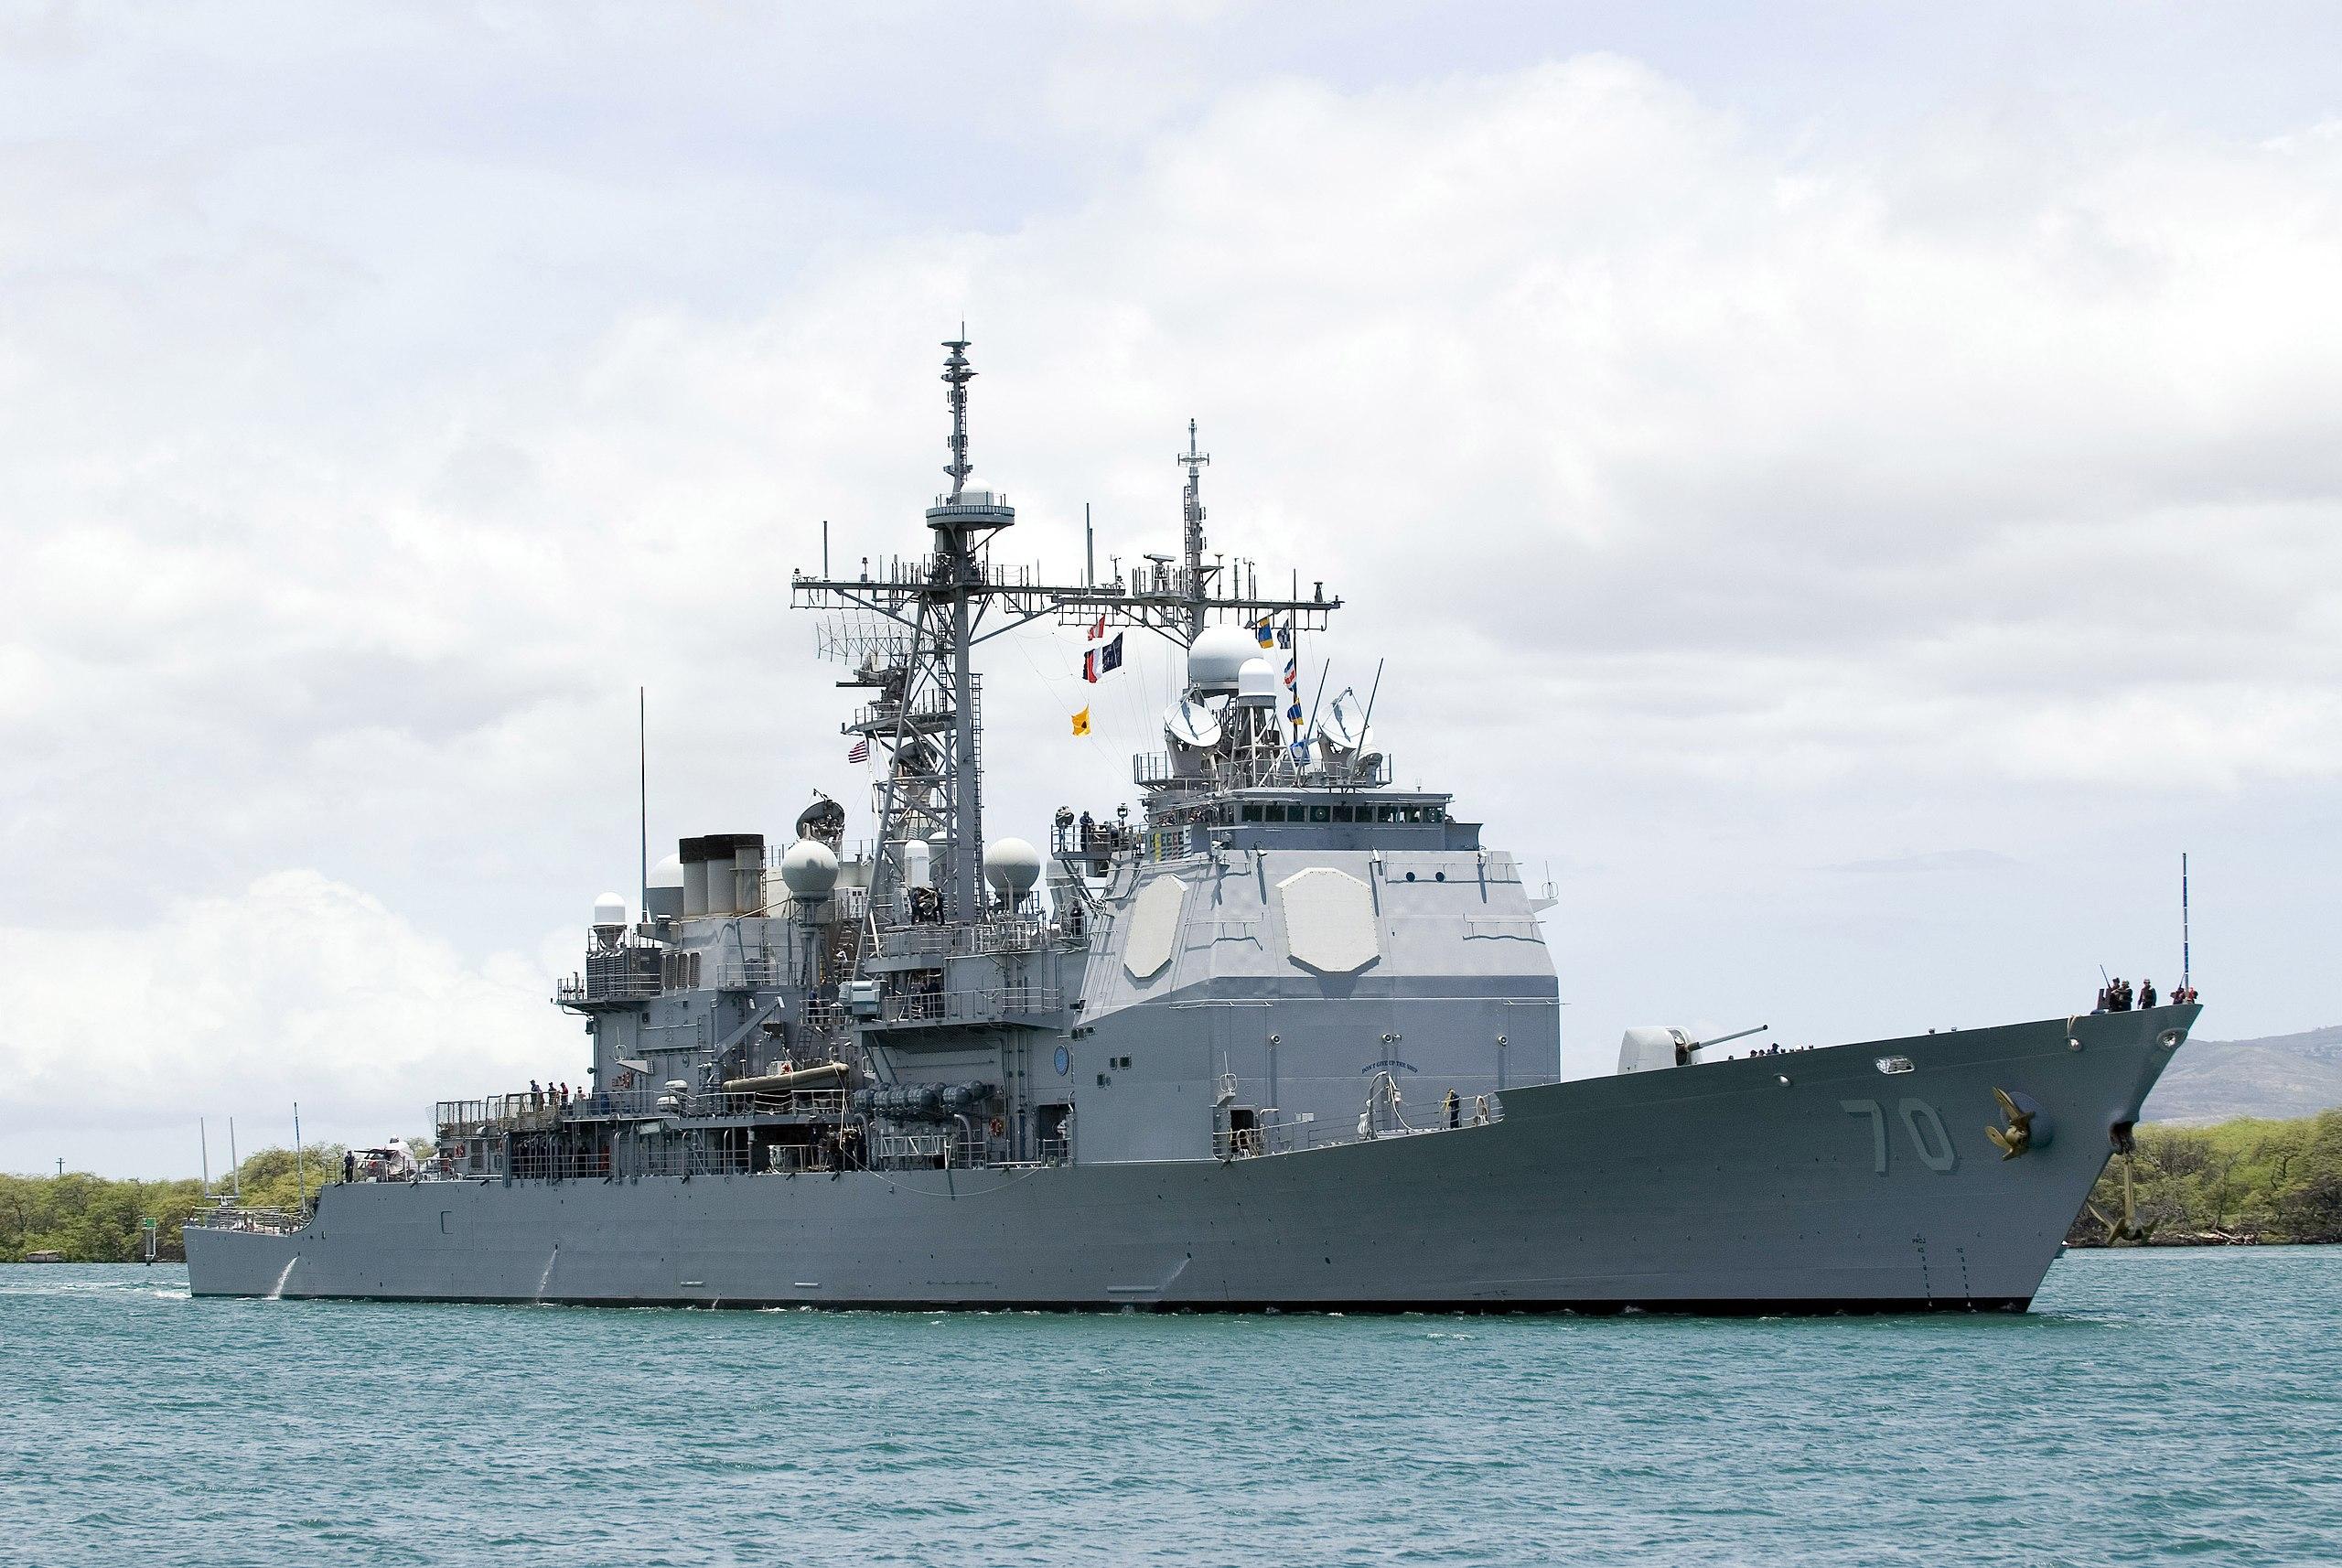 USS Lake Erie CG-70